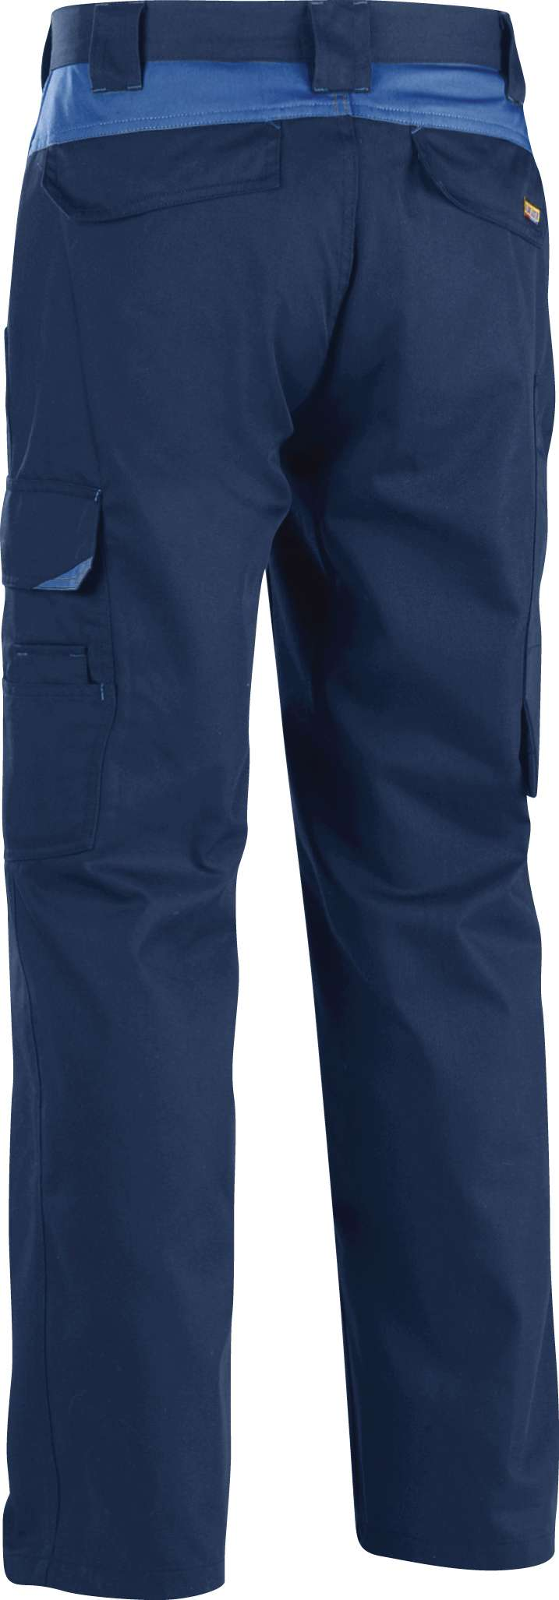 Blaklader Werkbroeken 14041210 marineblauw-korenblauw(8884)